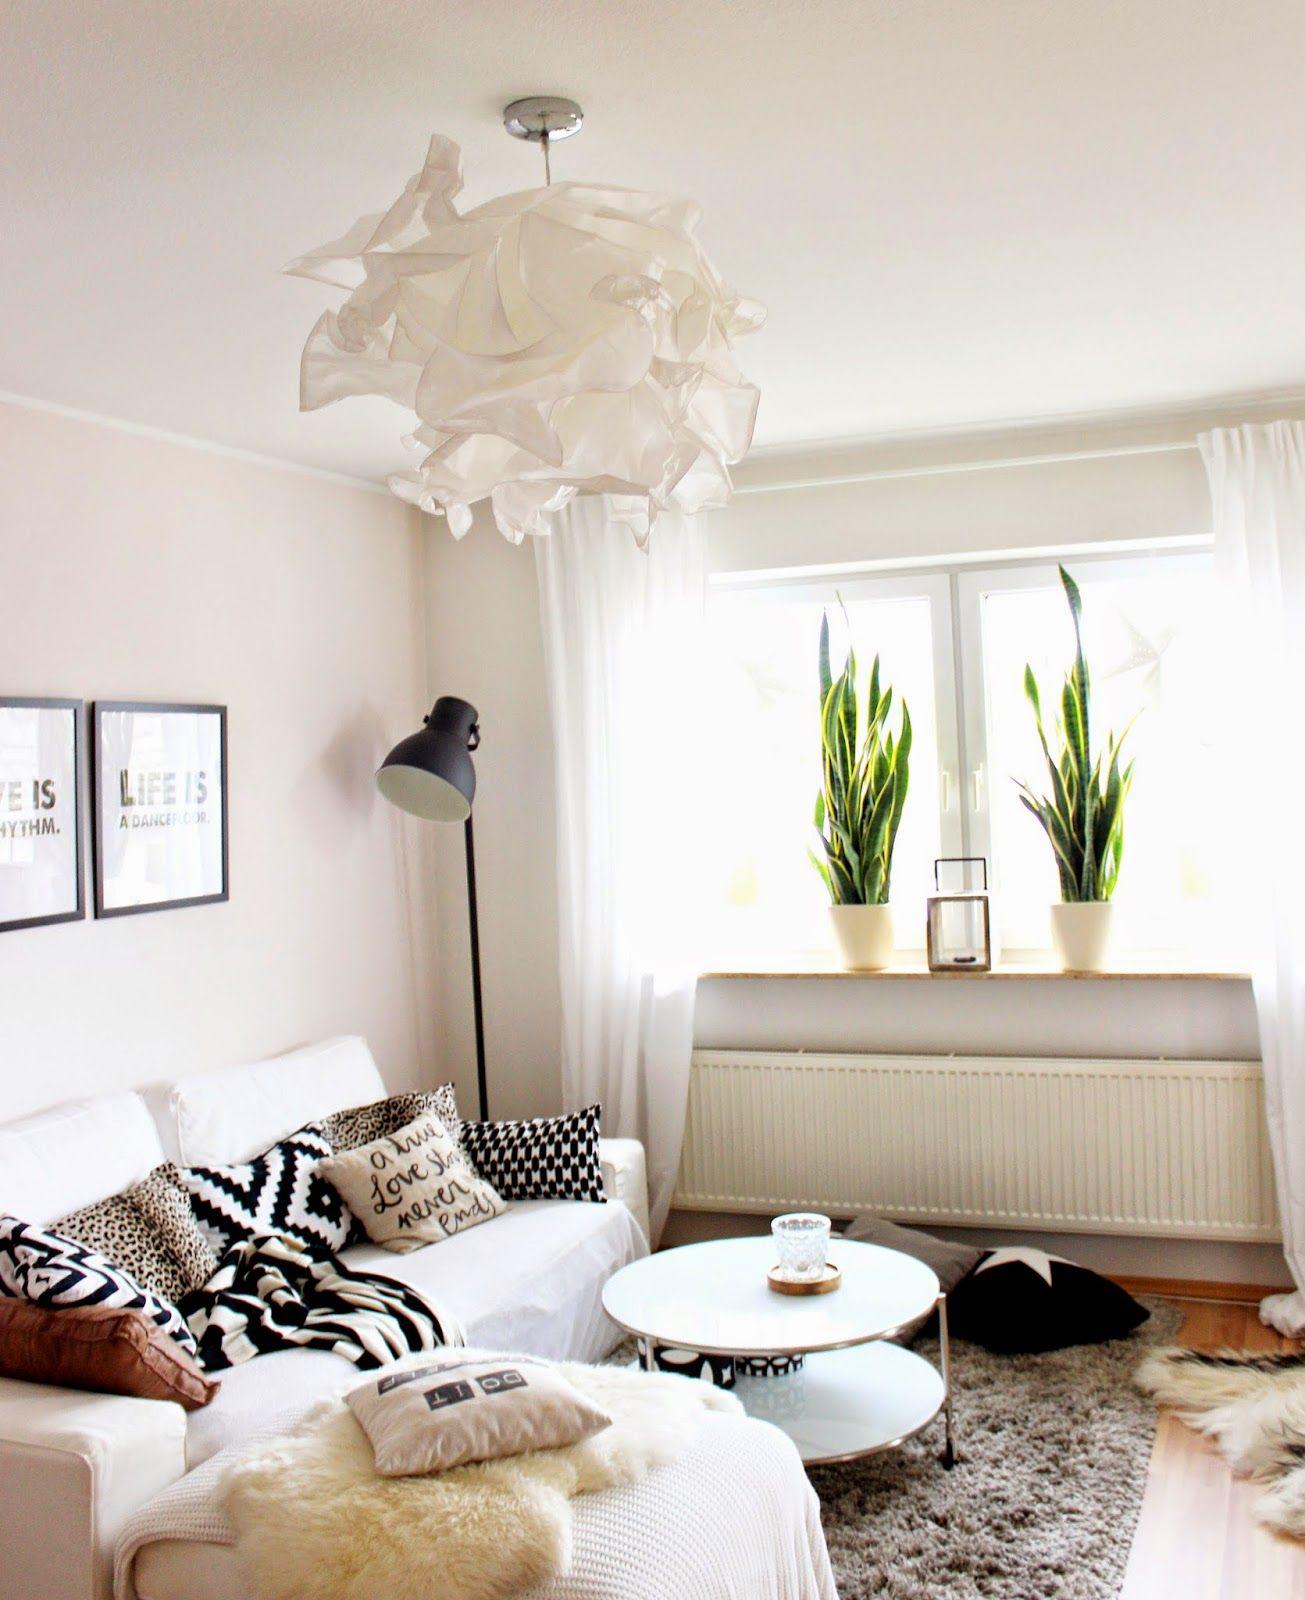 Wohninspirationen New In IKEA Krusning Lamp